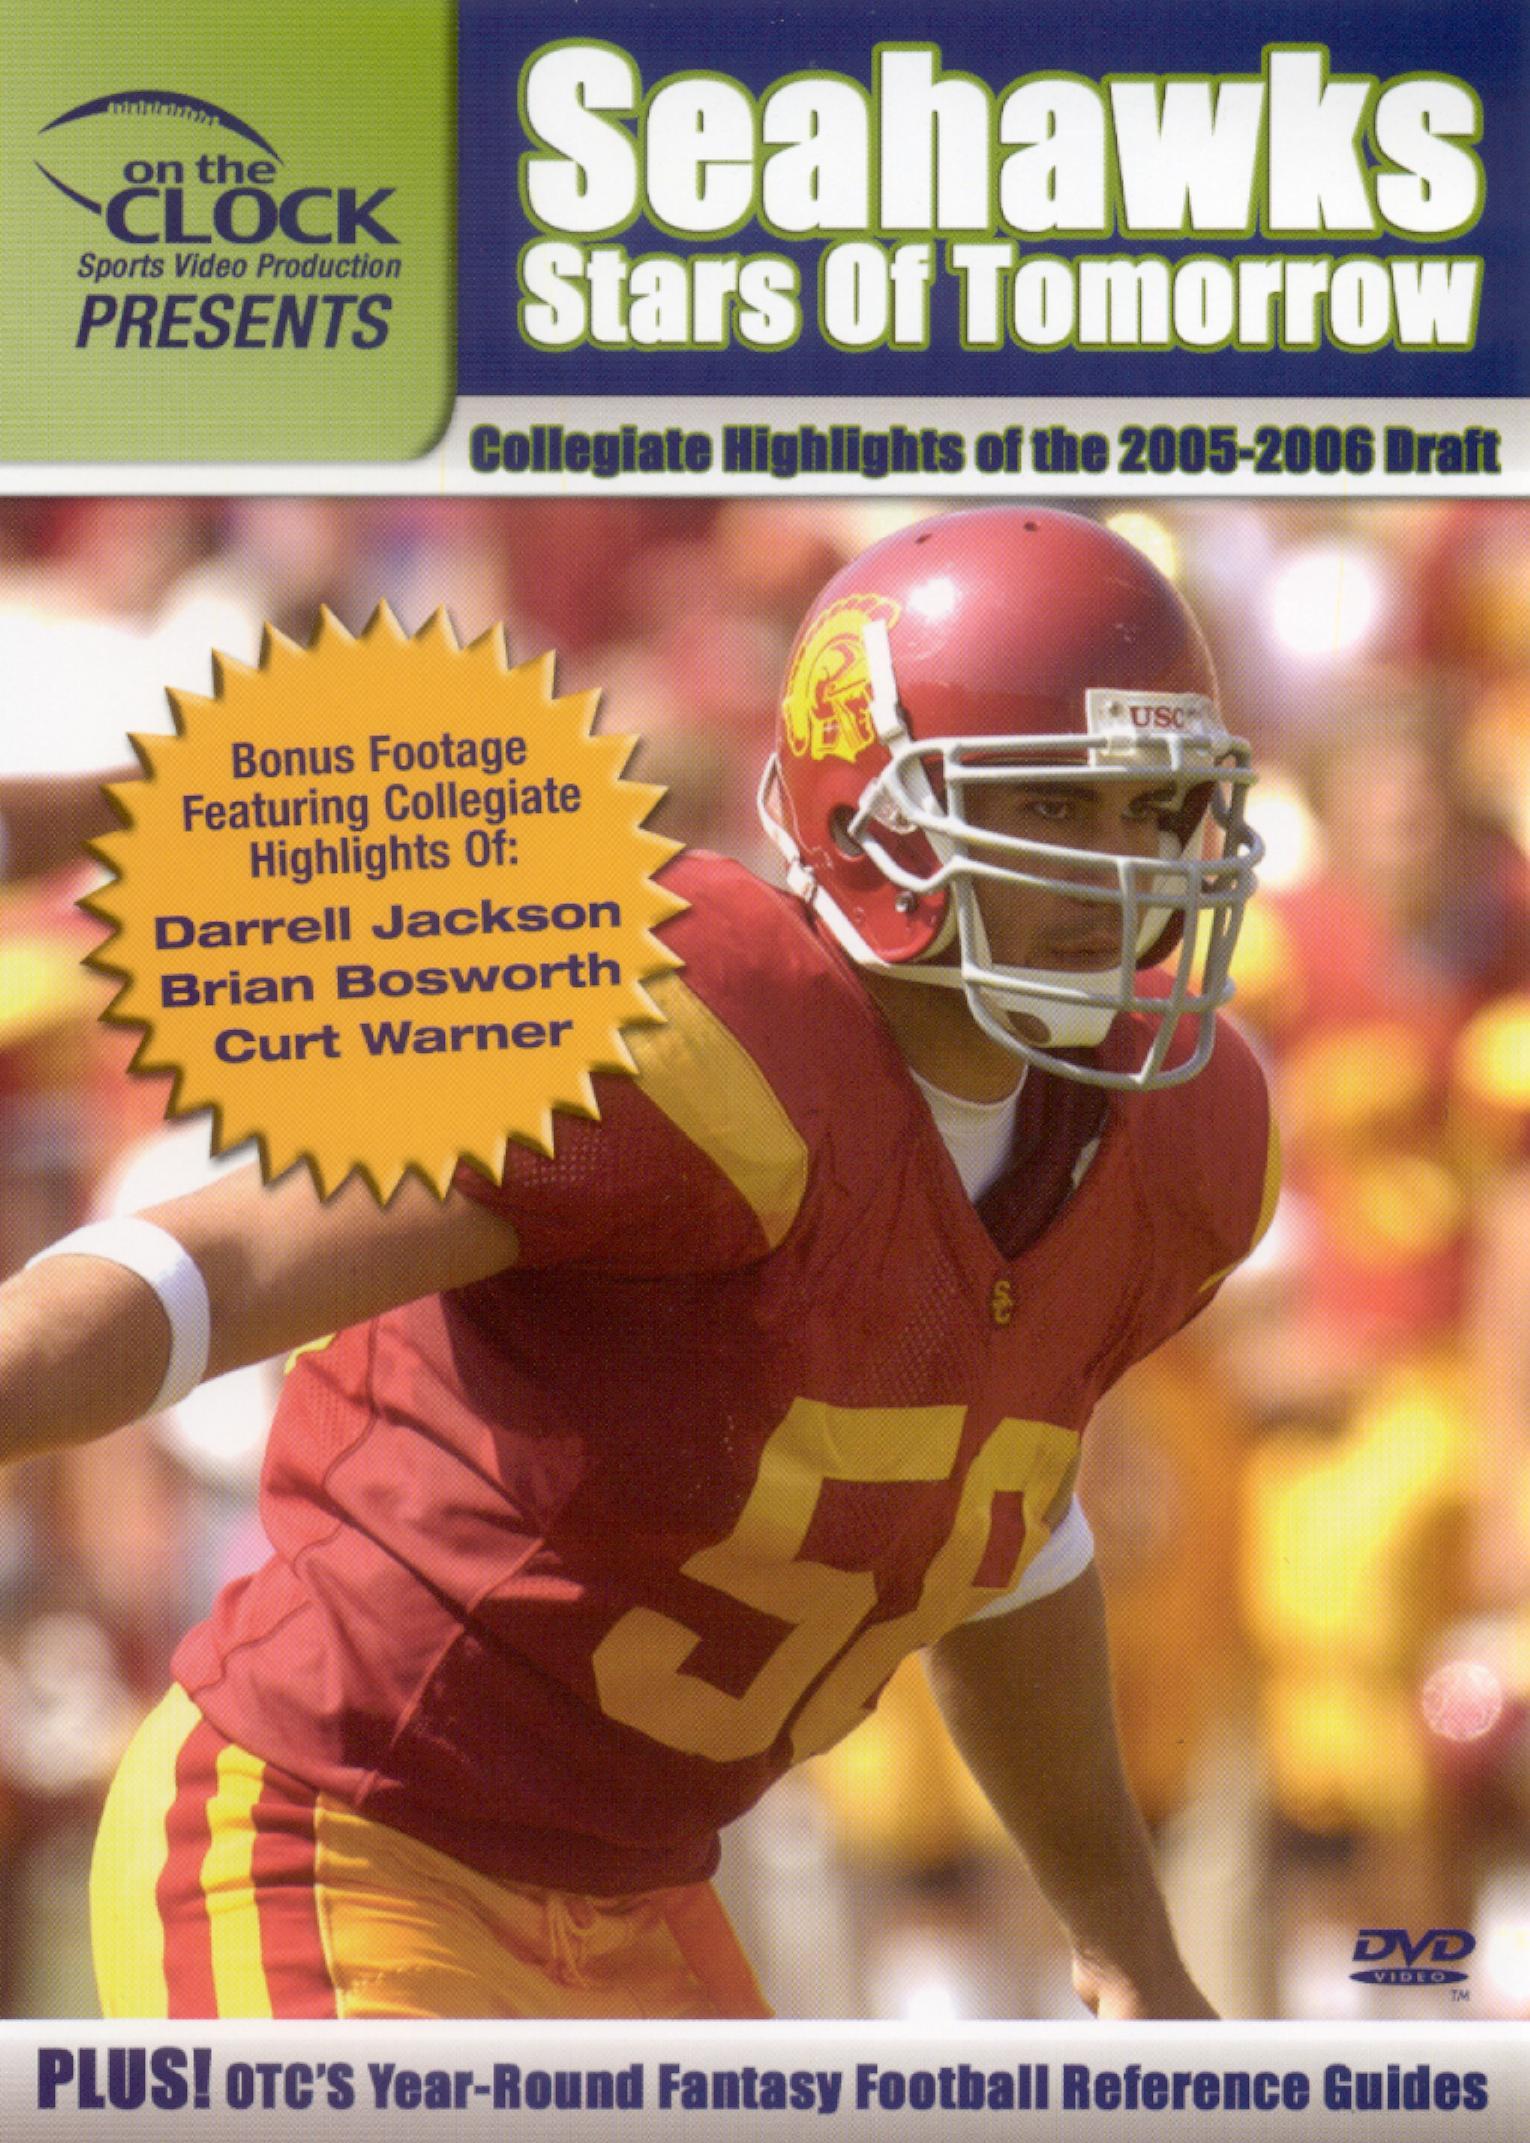 On the Clock Presents: Seahawks - 2005 Draft Picks Collegiate Highlights